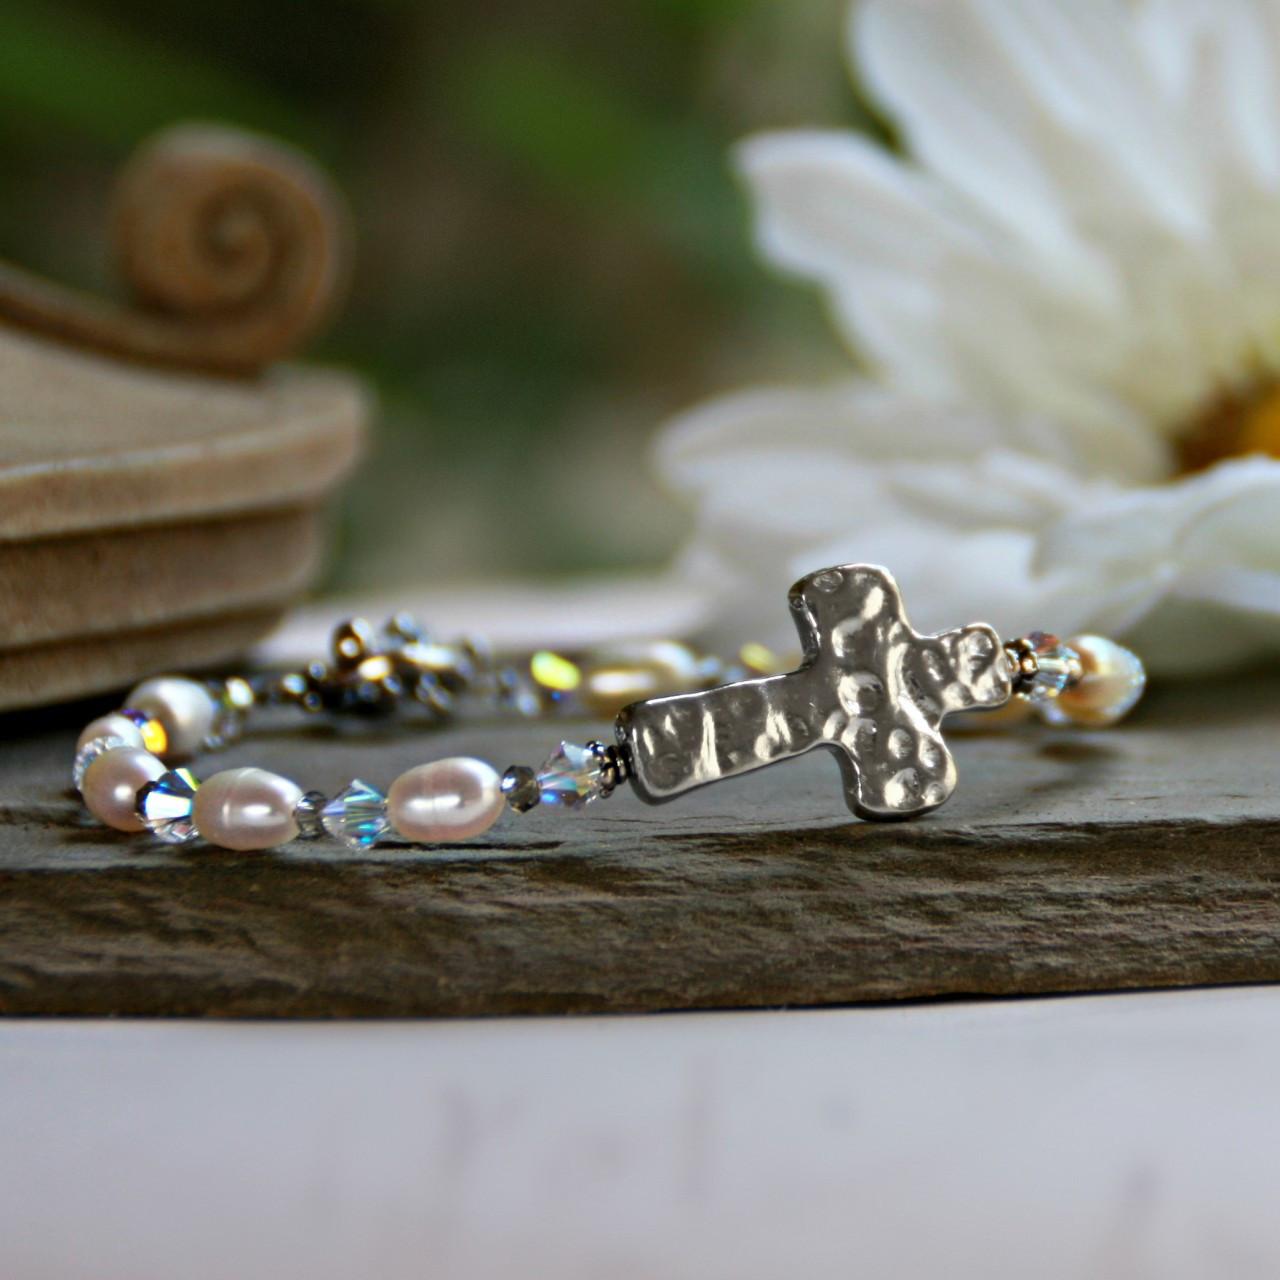 IN-116 Hammered Design Freshwater Pearls & Crystals Bracelet